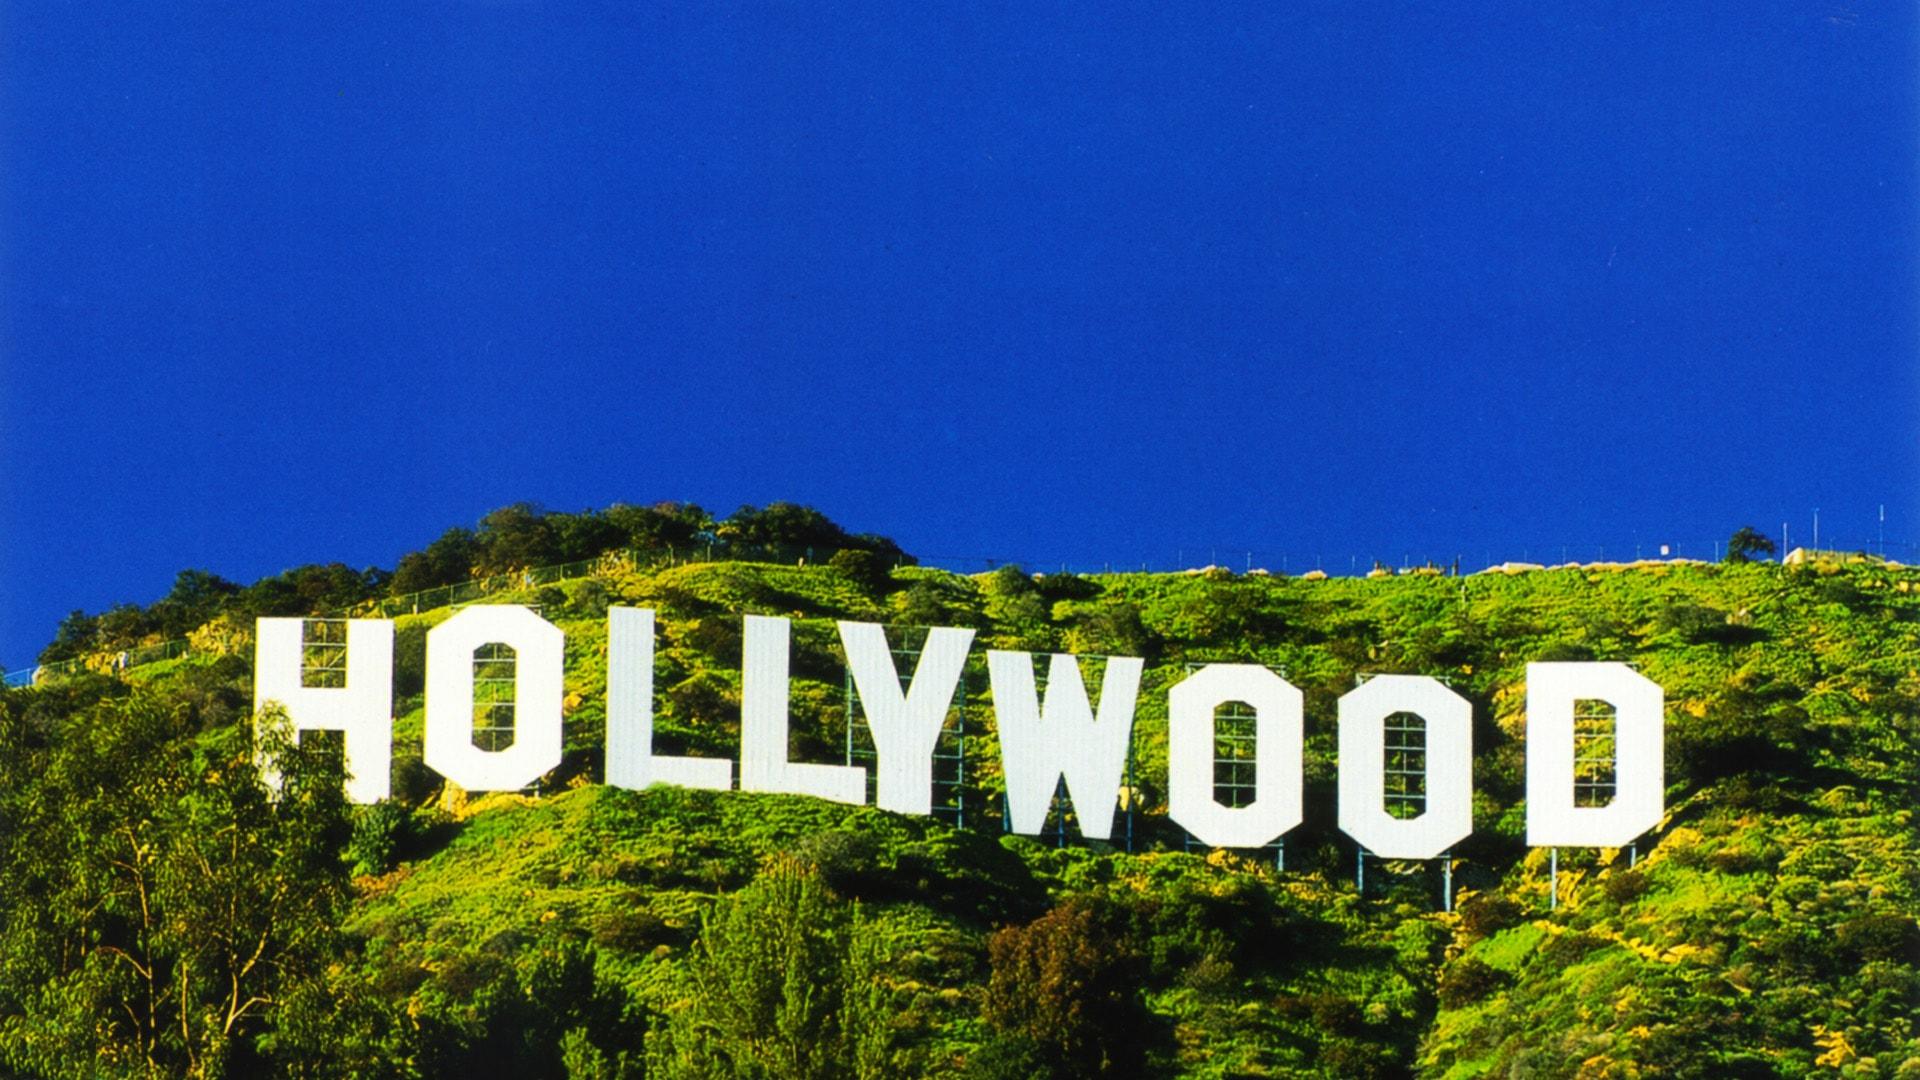 Los Angeles desktop wallpaper